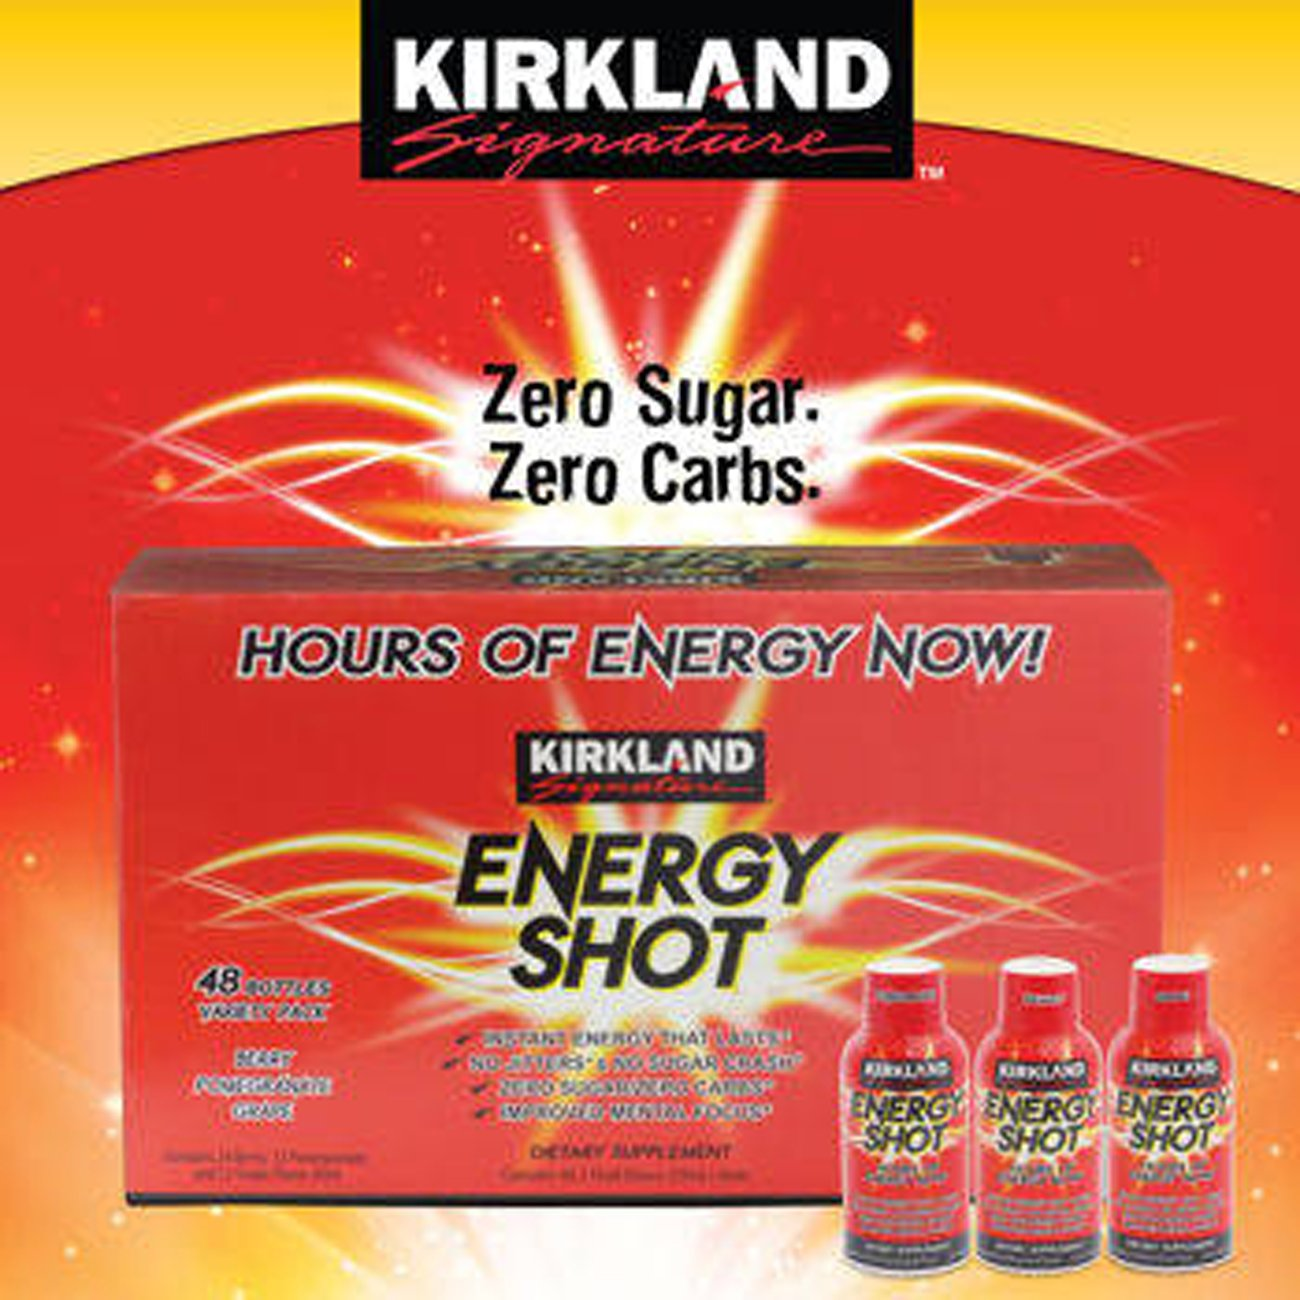 Kirkland Signature™ Energy Shot 48 Count, 2 Ounces Each